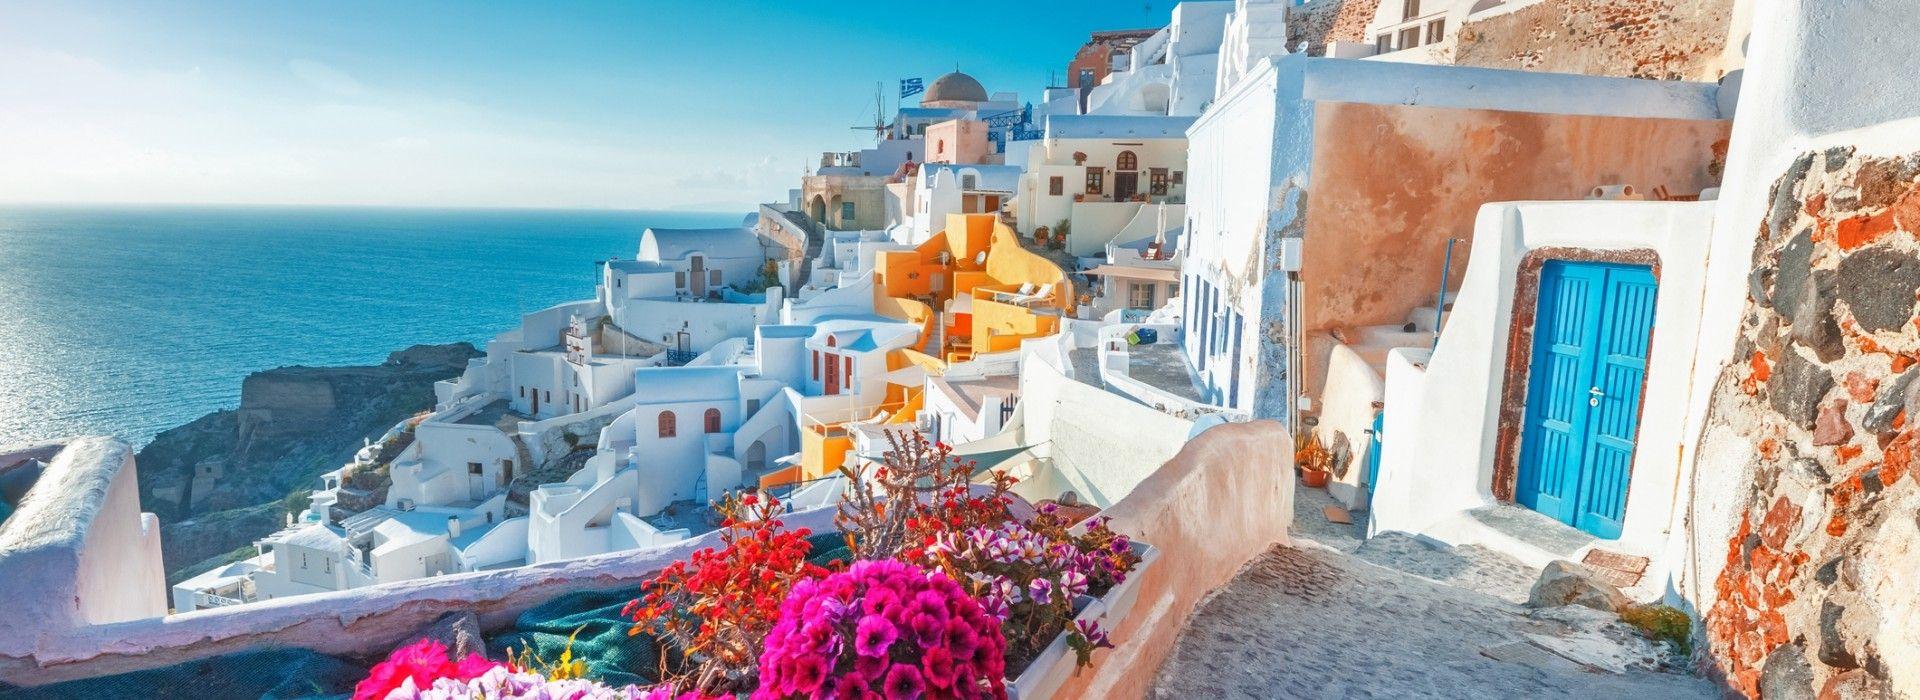 Wine tasting tours in Mediterranean